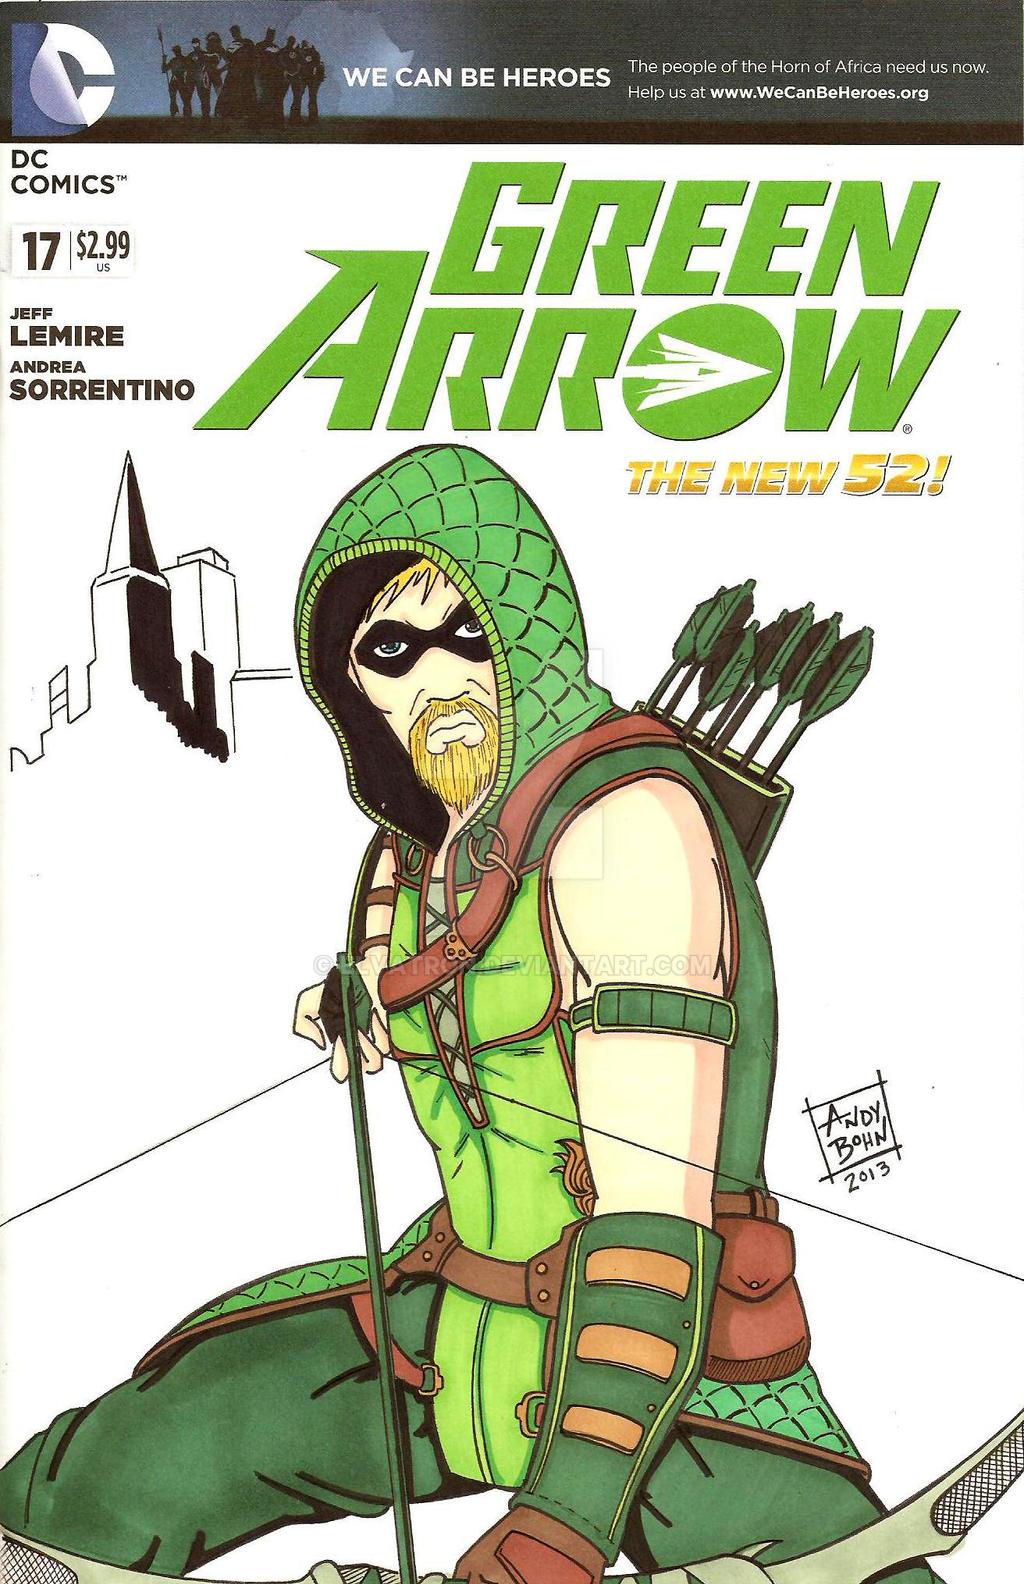 Injustice Green Arrow by Elvatron